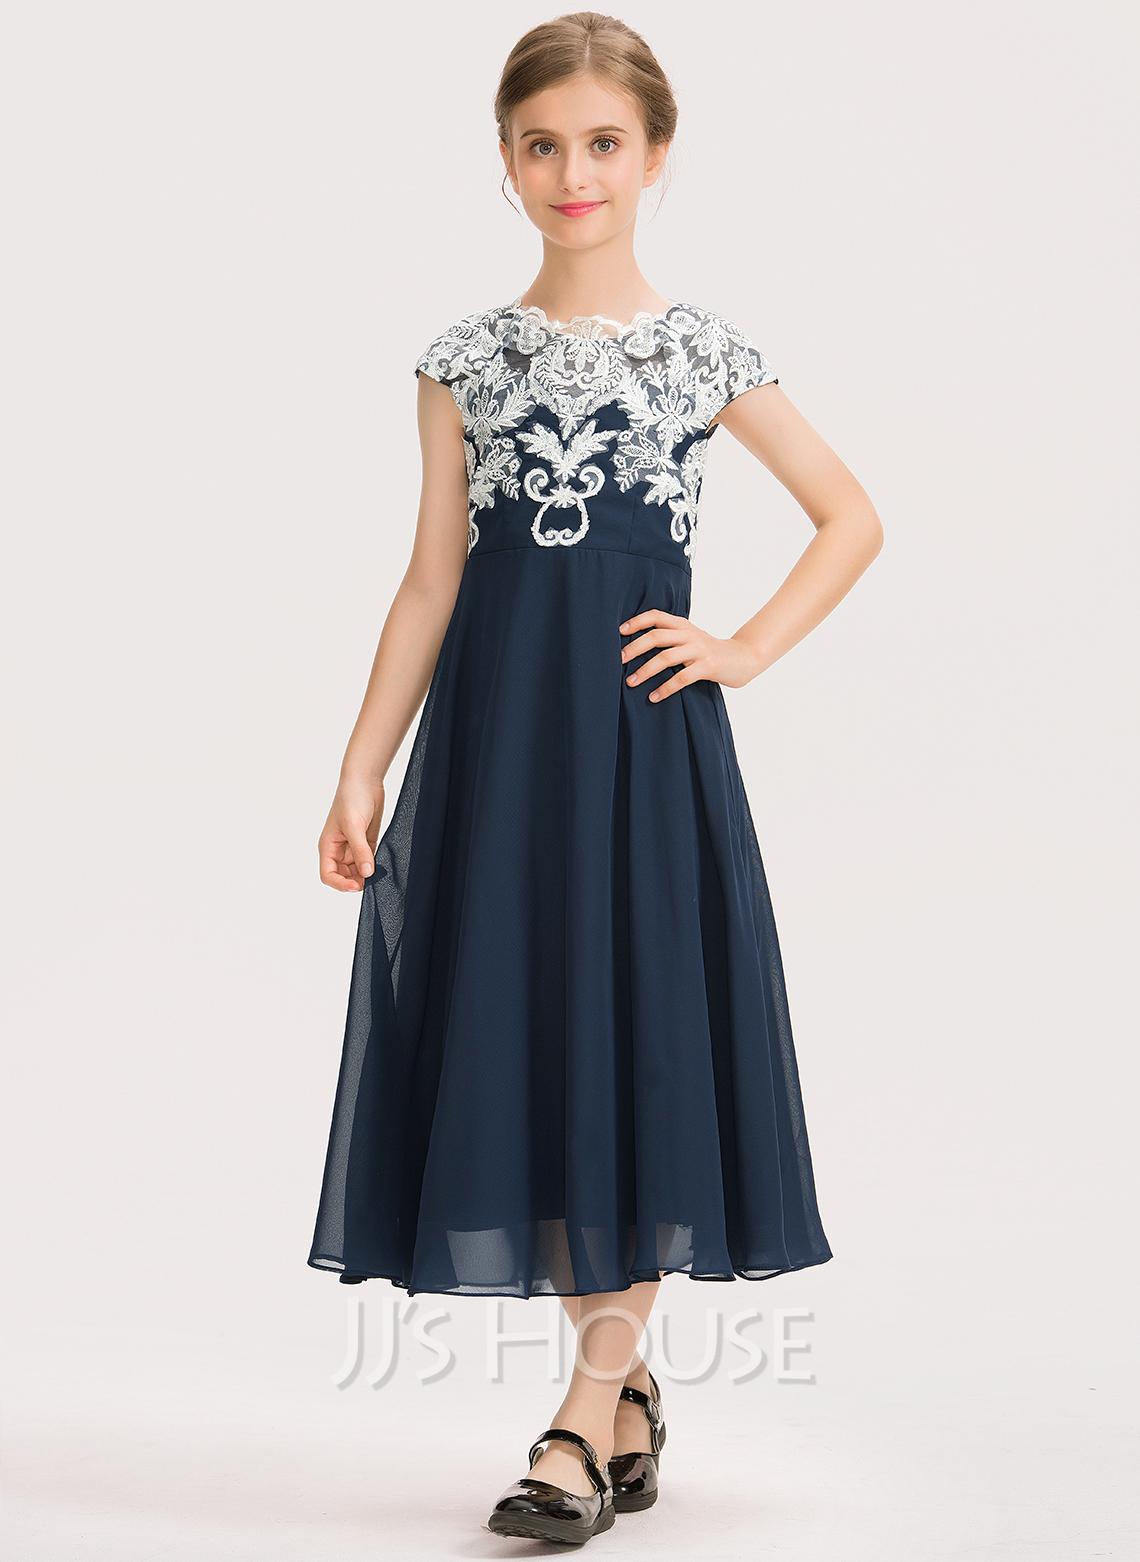 A-Line Scoop Neck Tea-Length Chiffon Lace Junior Bridesmaid Dress